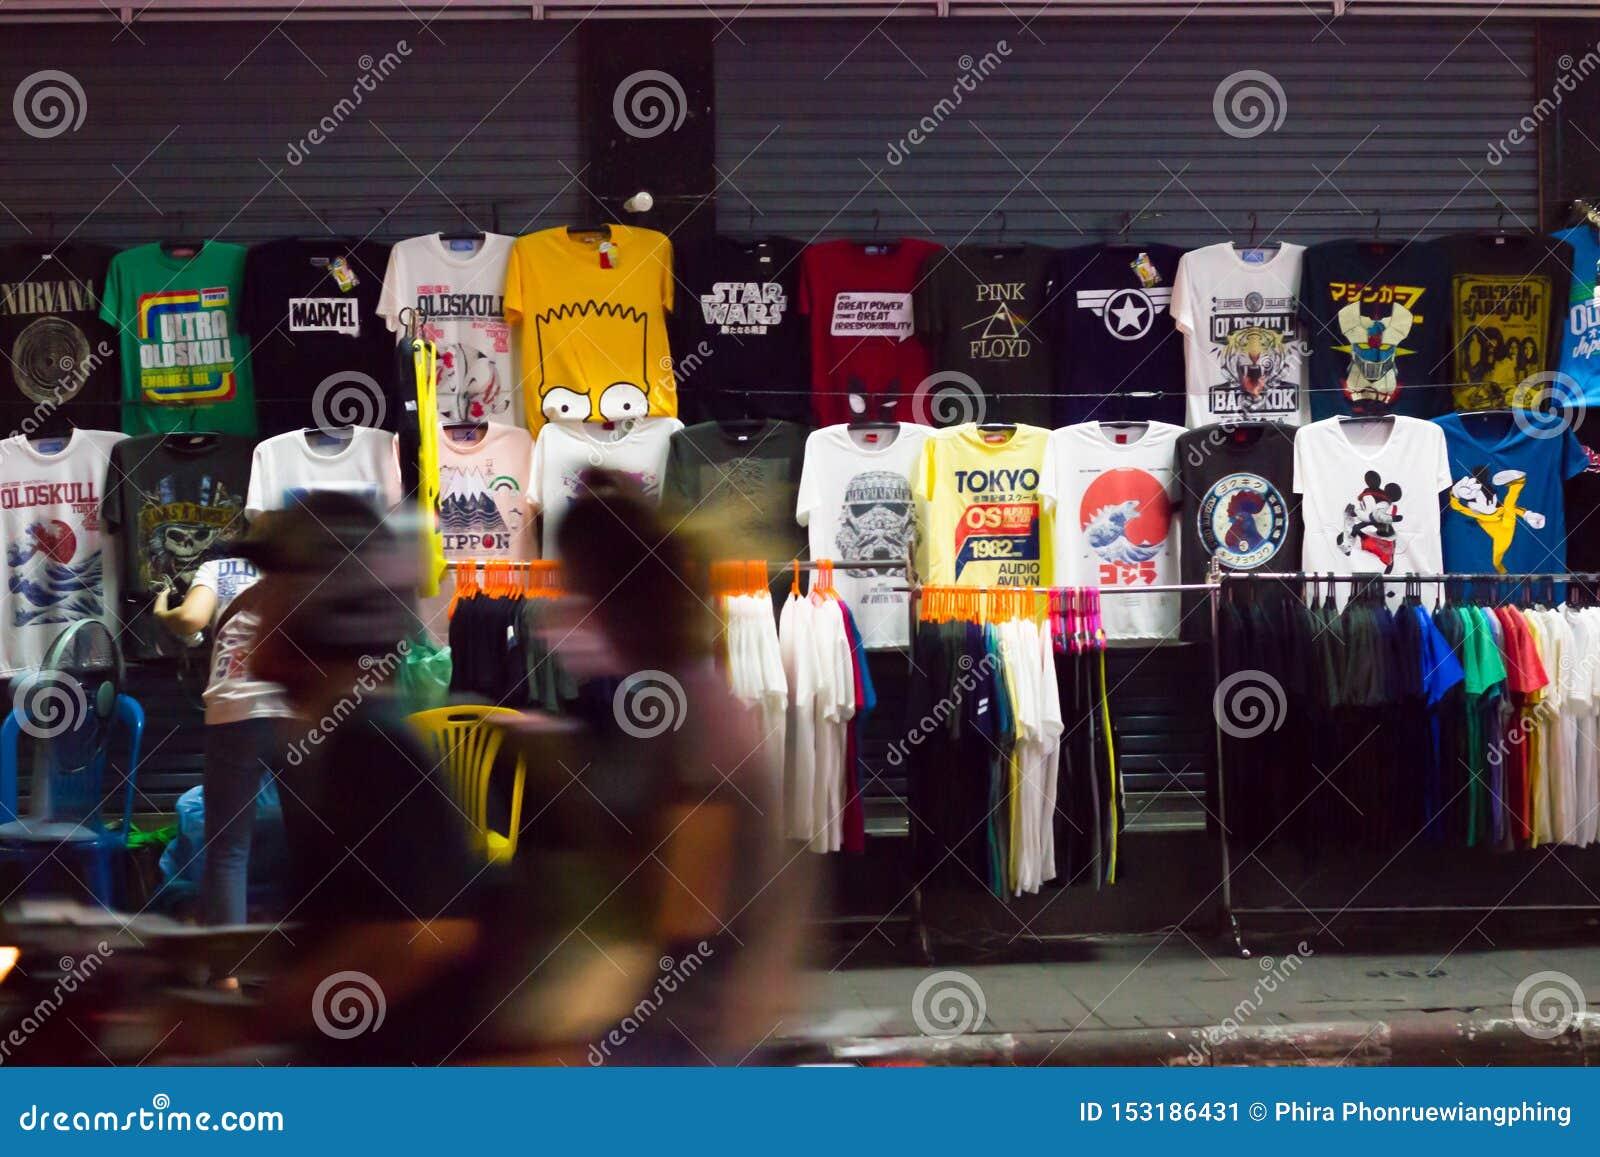 Kleidung kauft am Nachtstraßenrand, Khaosan-Straße, Bangkok, Thailand